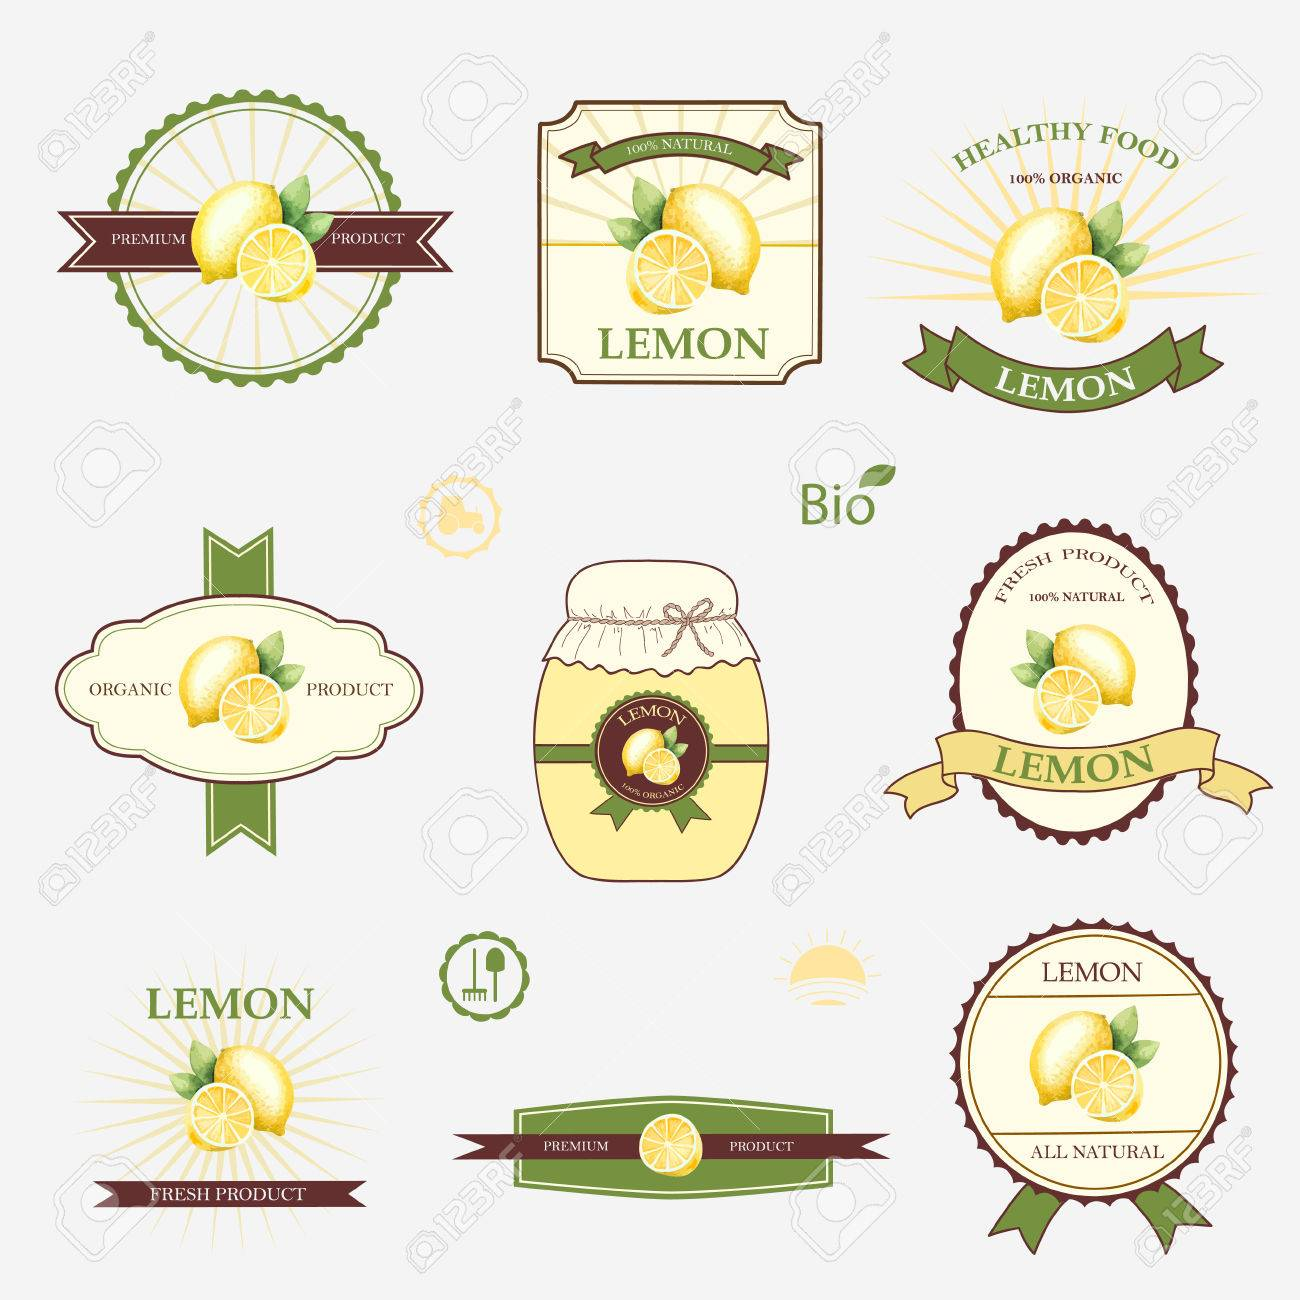 Lemon Set Of Label Design And Templates Vector Illustration – Label Design Templates